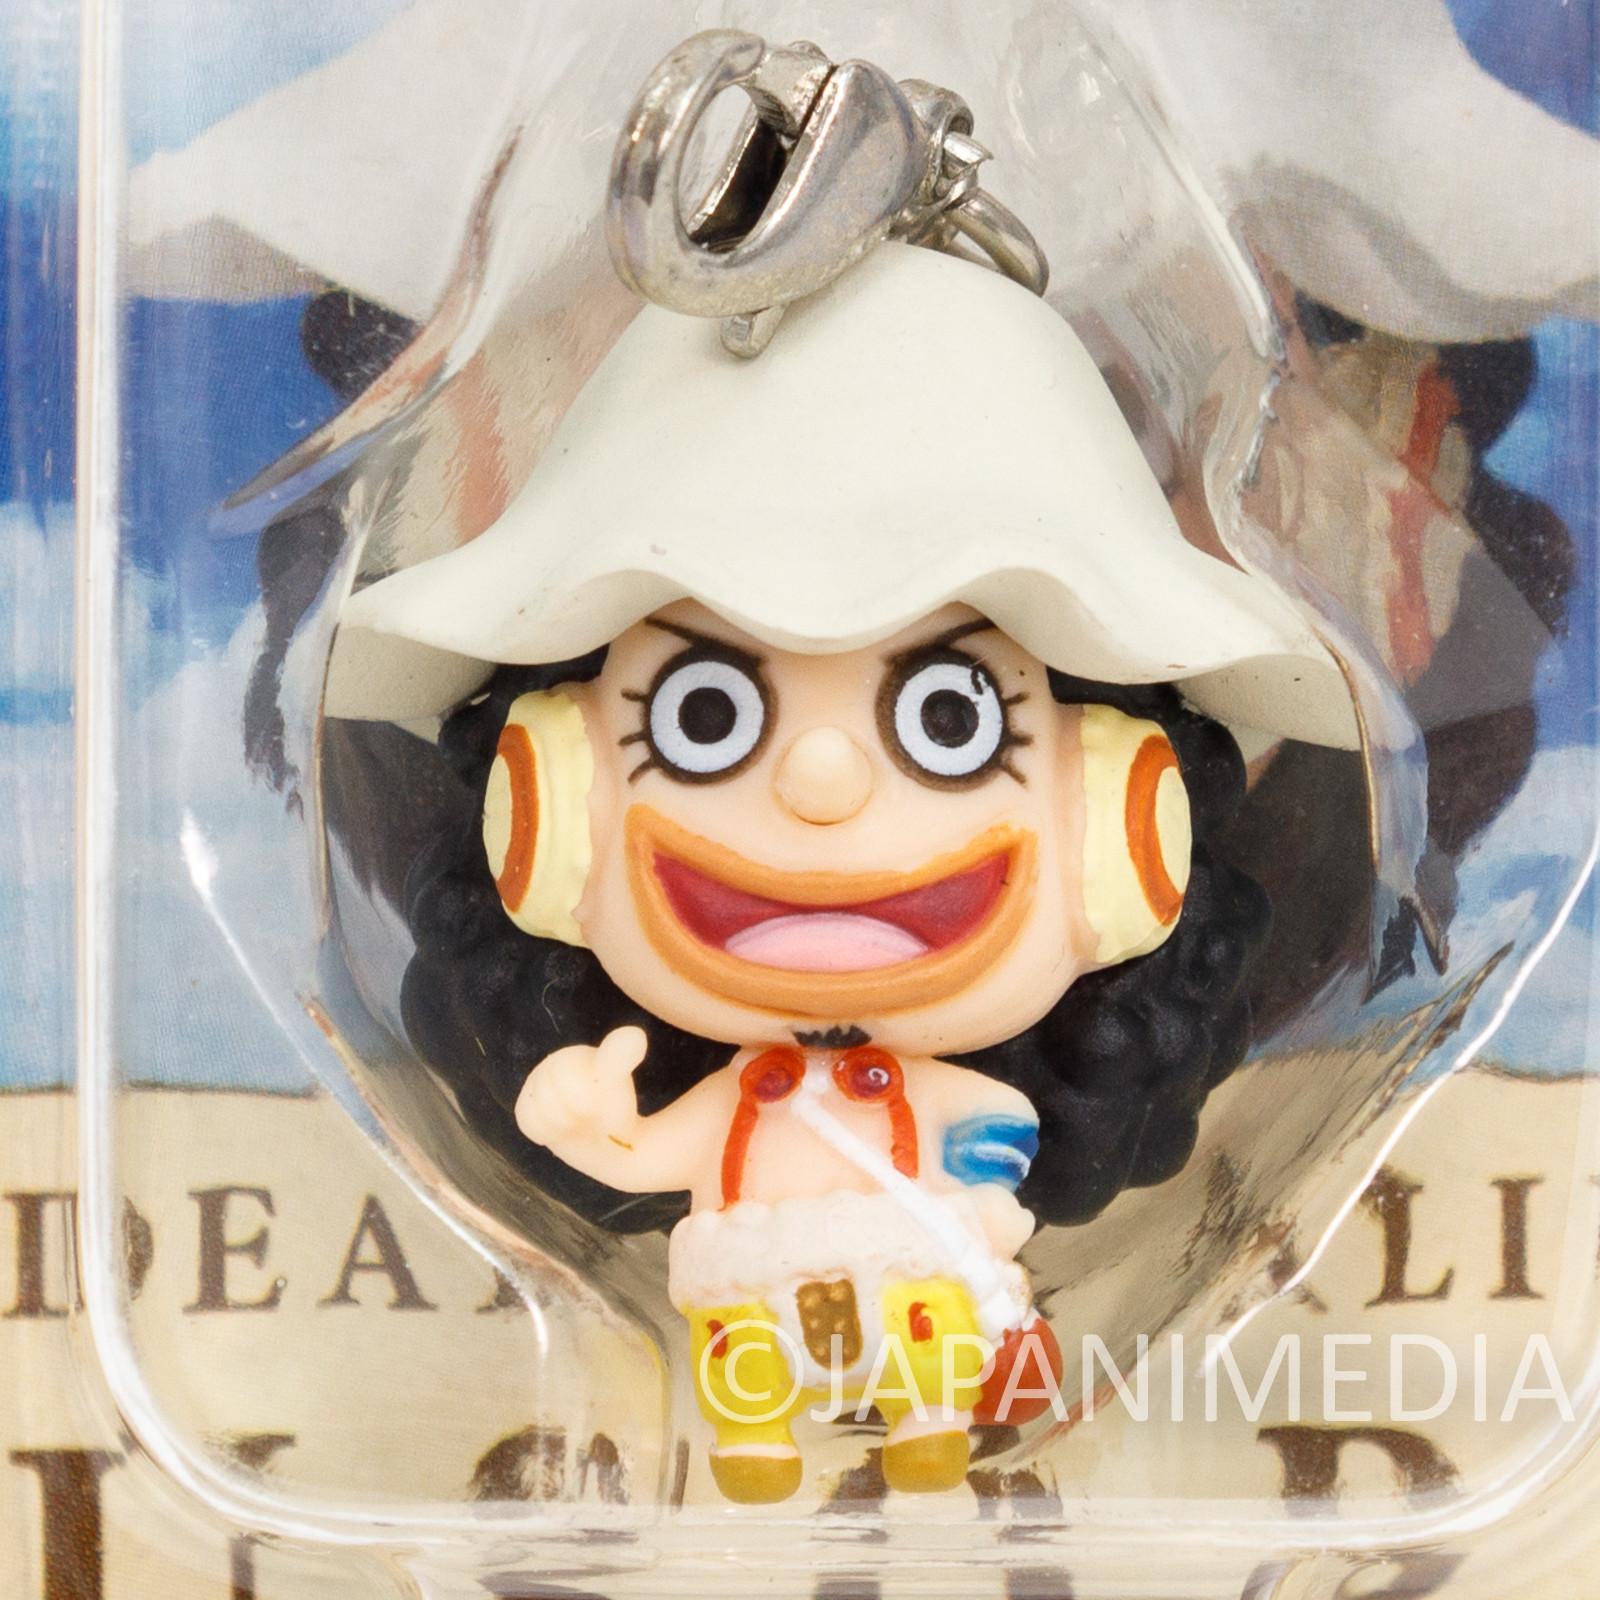 One Piece Usopp Mini Figure Chara Fortune Megahouse JAPAN ANIME